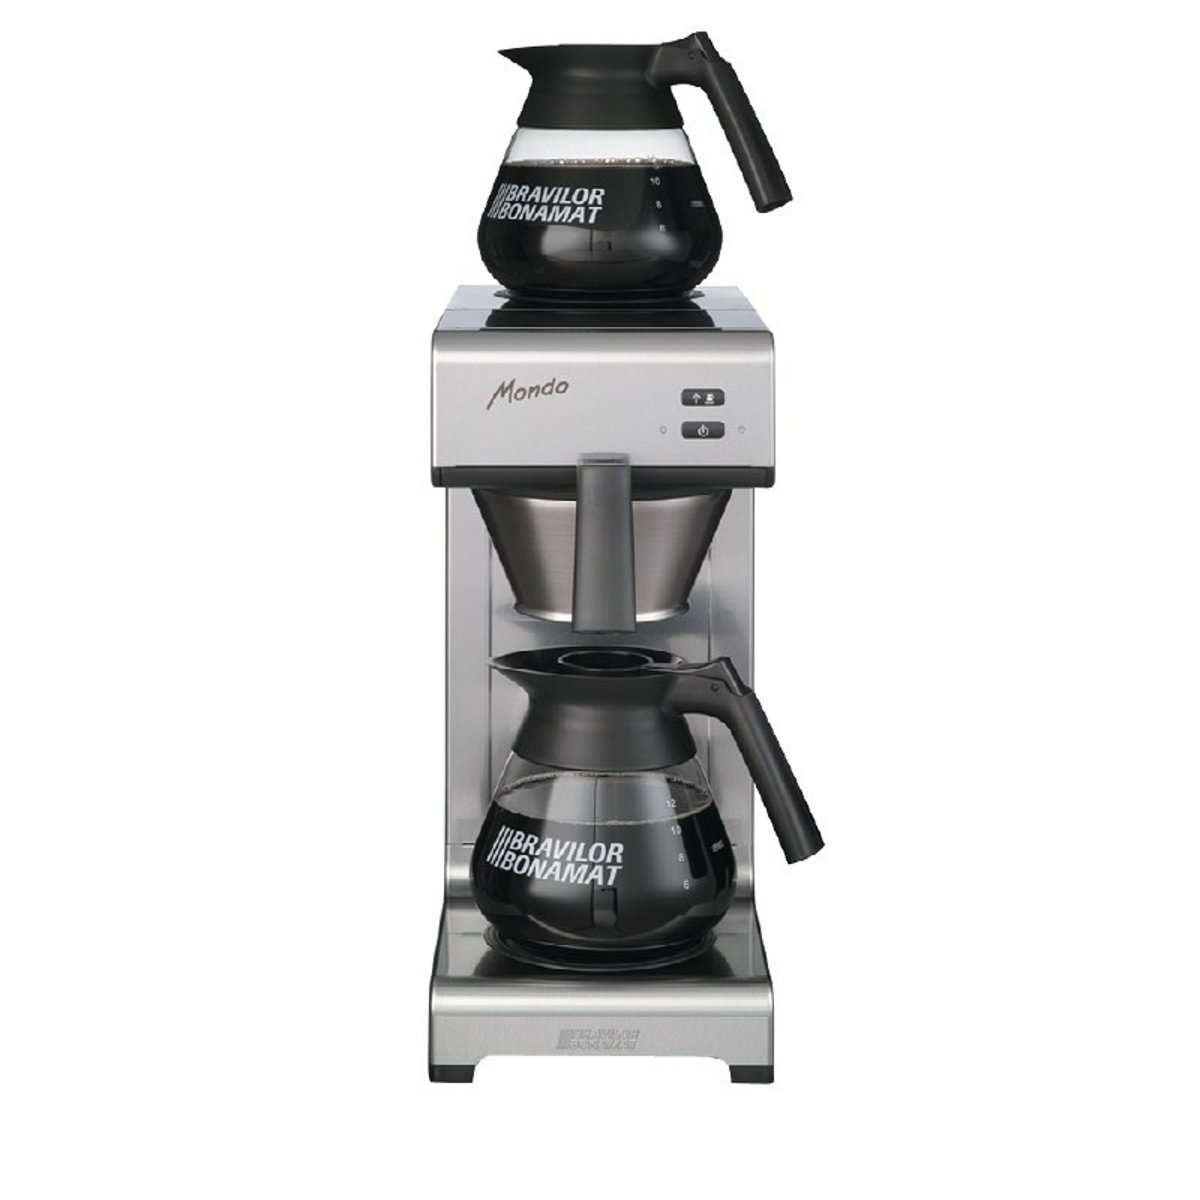 Bravilor Bonamat Mondo Snelzet koffiezetapparaat